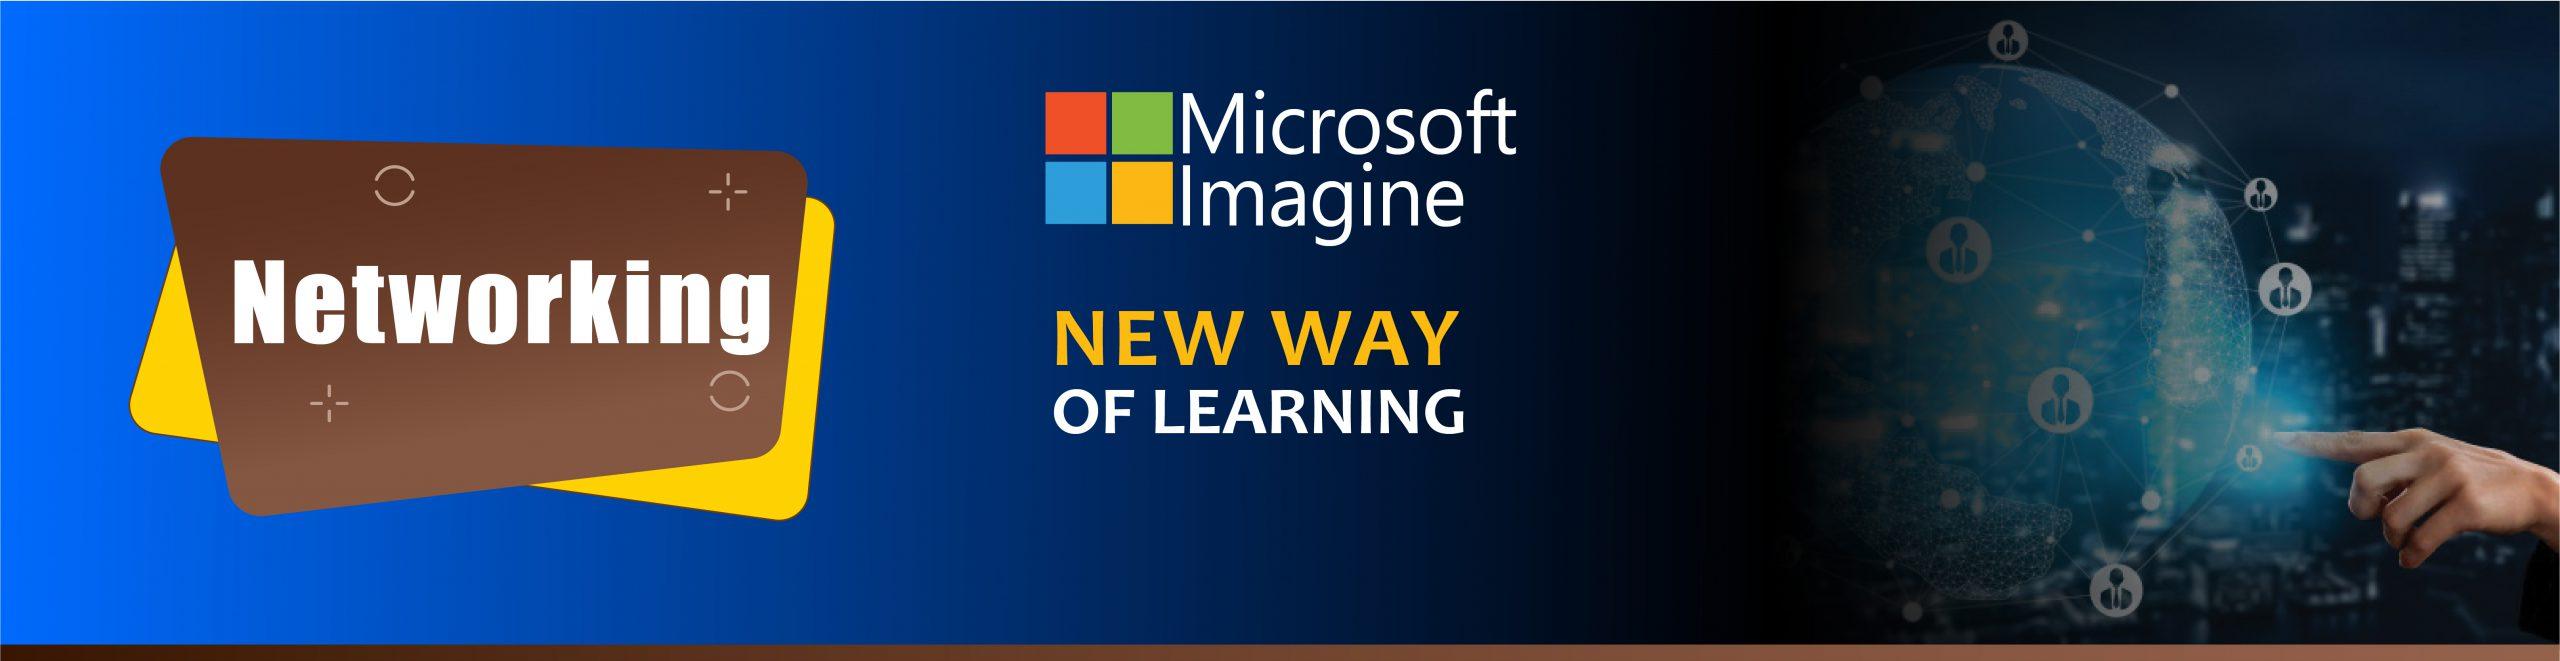 Microsoft_Networking